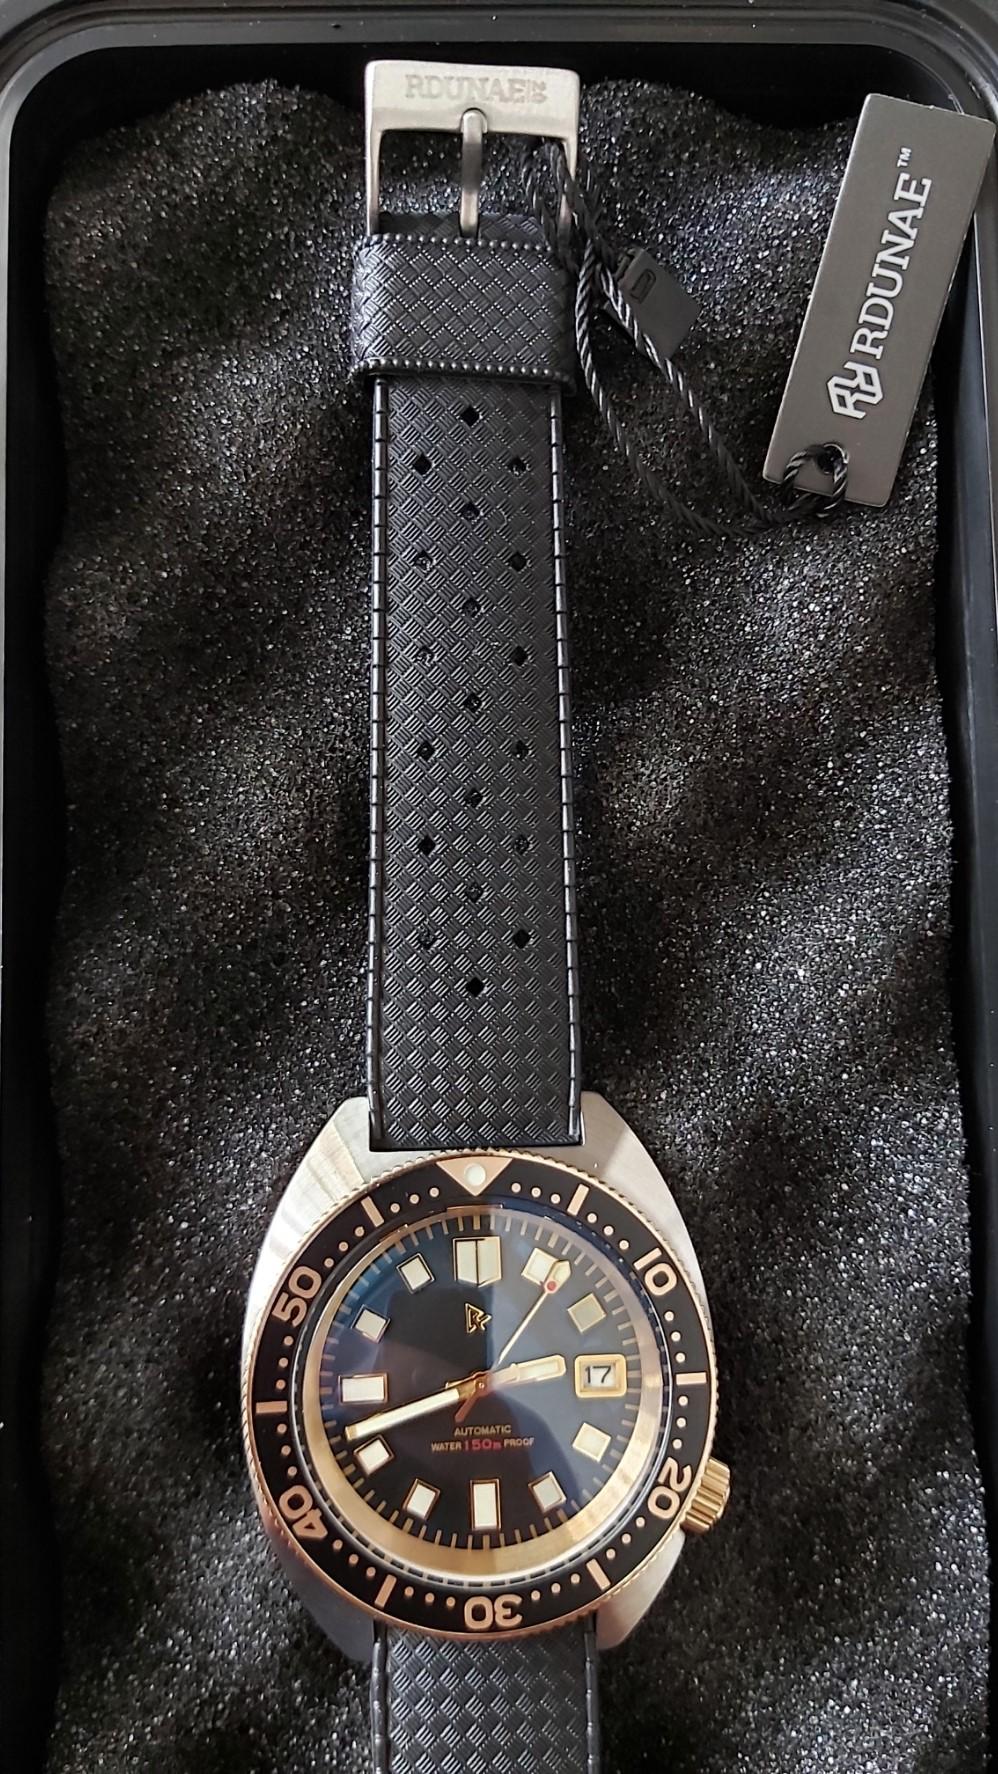 Retangula Rdunae 6105-8000 Homage: Black & Gold